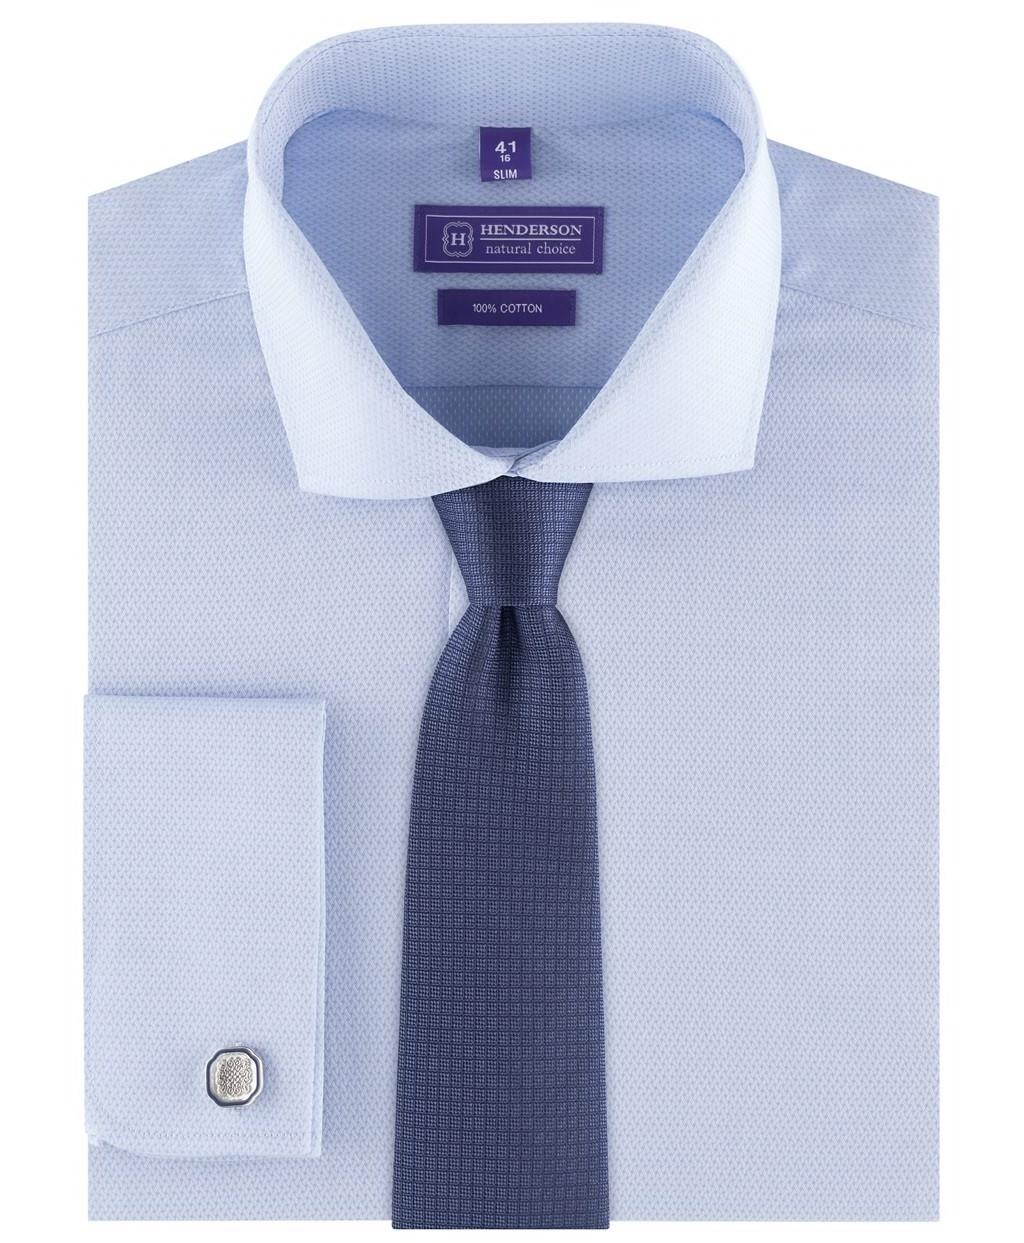 a7cccf24fd87521 Рубашка однотонная голубого цвета от Henderson